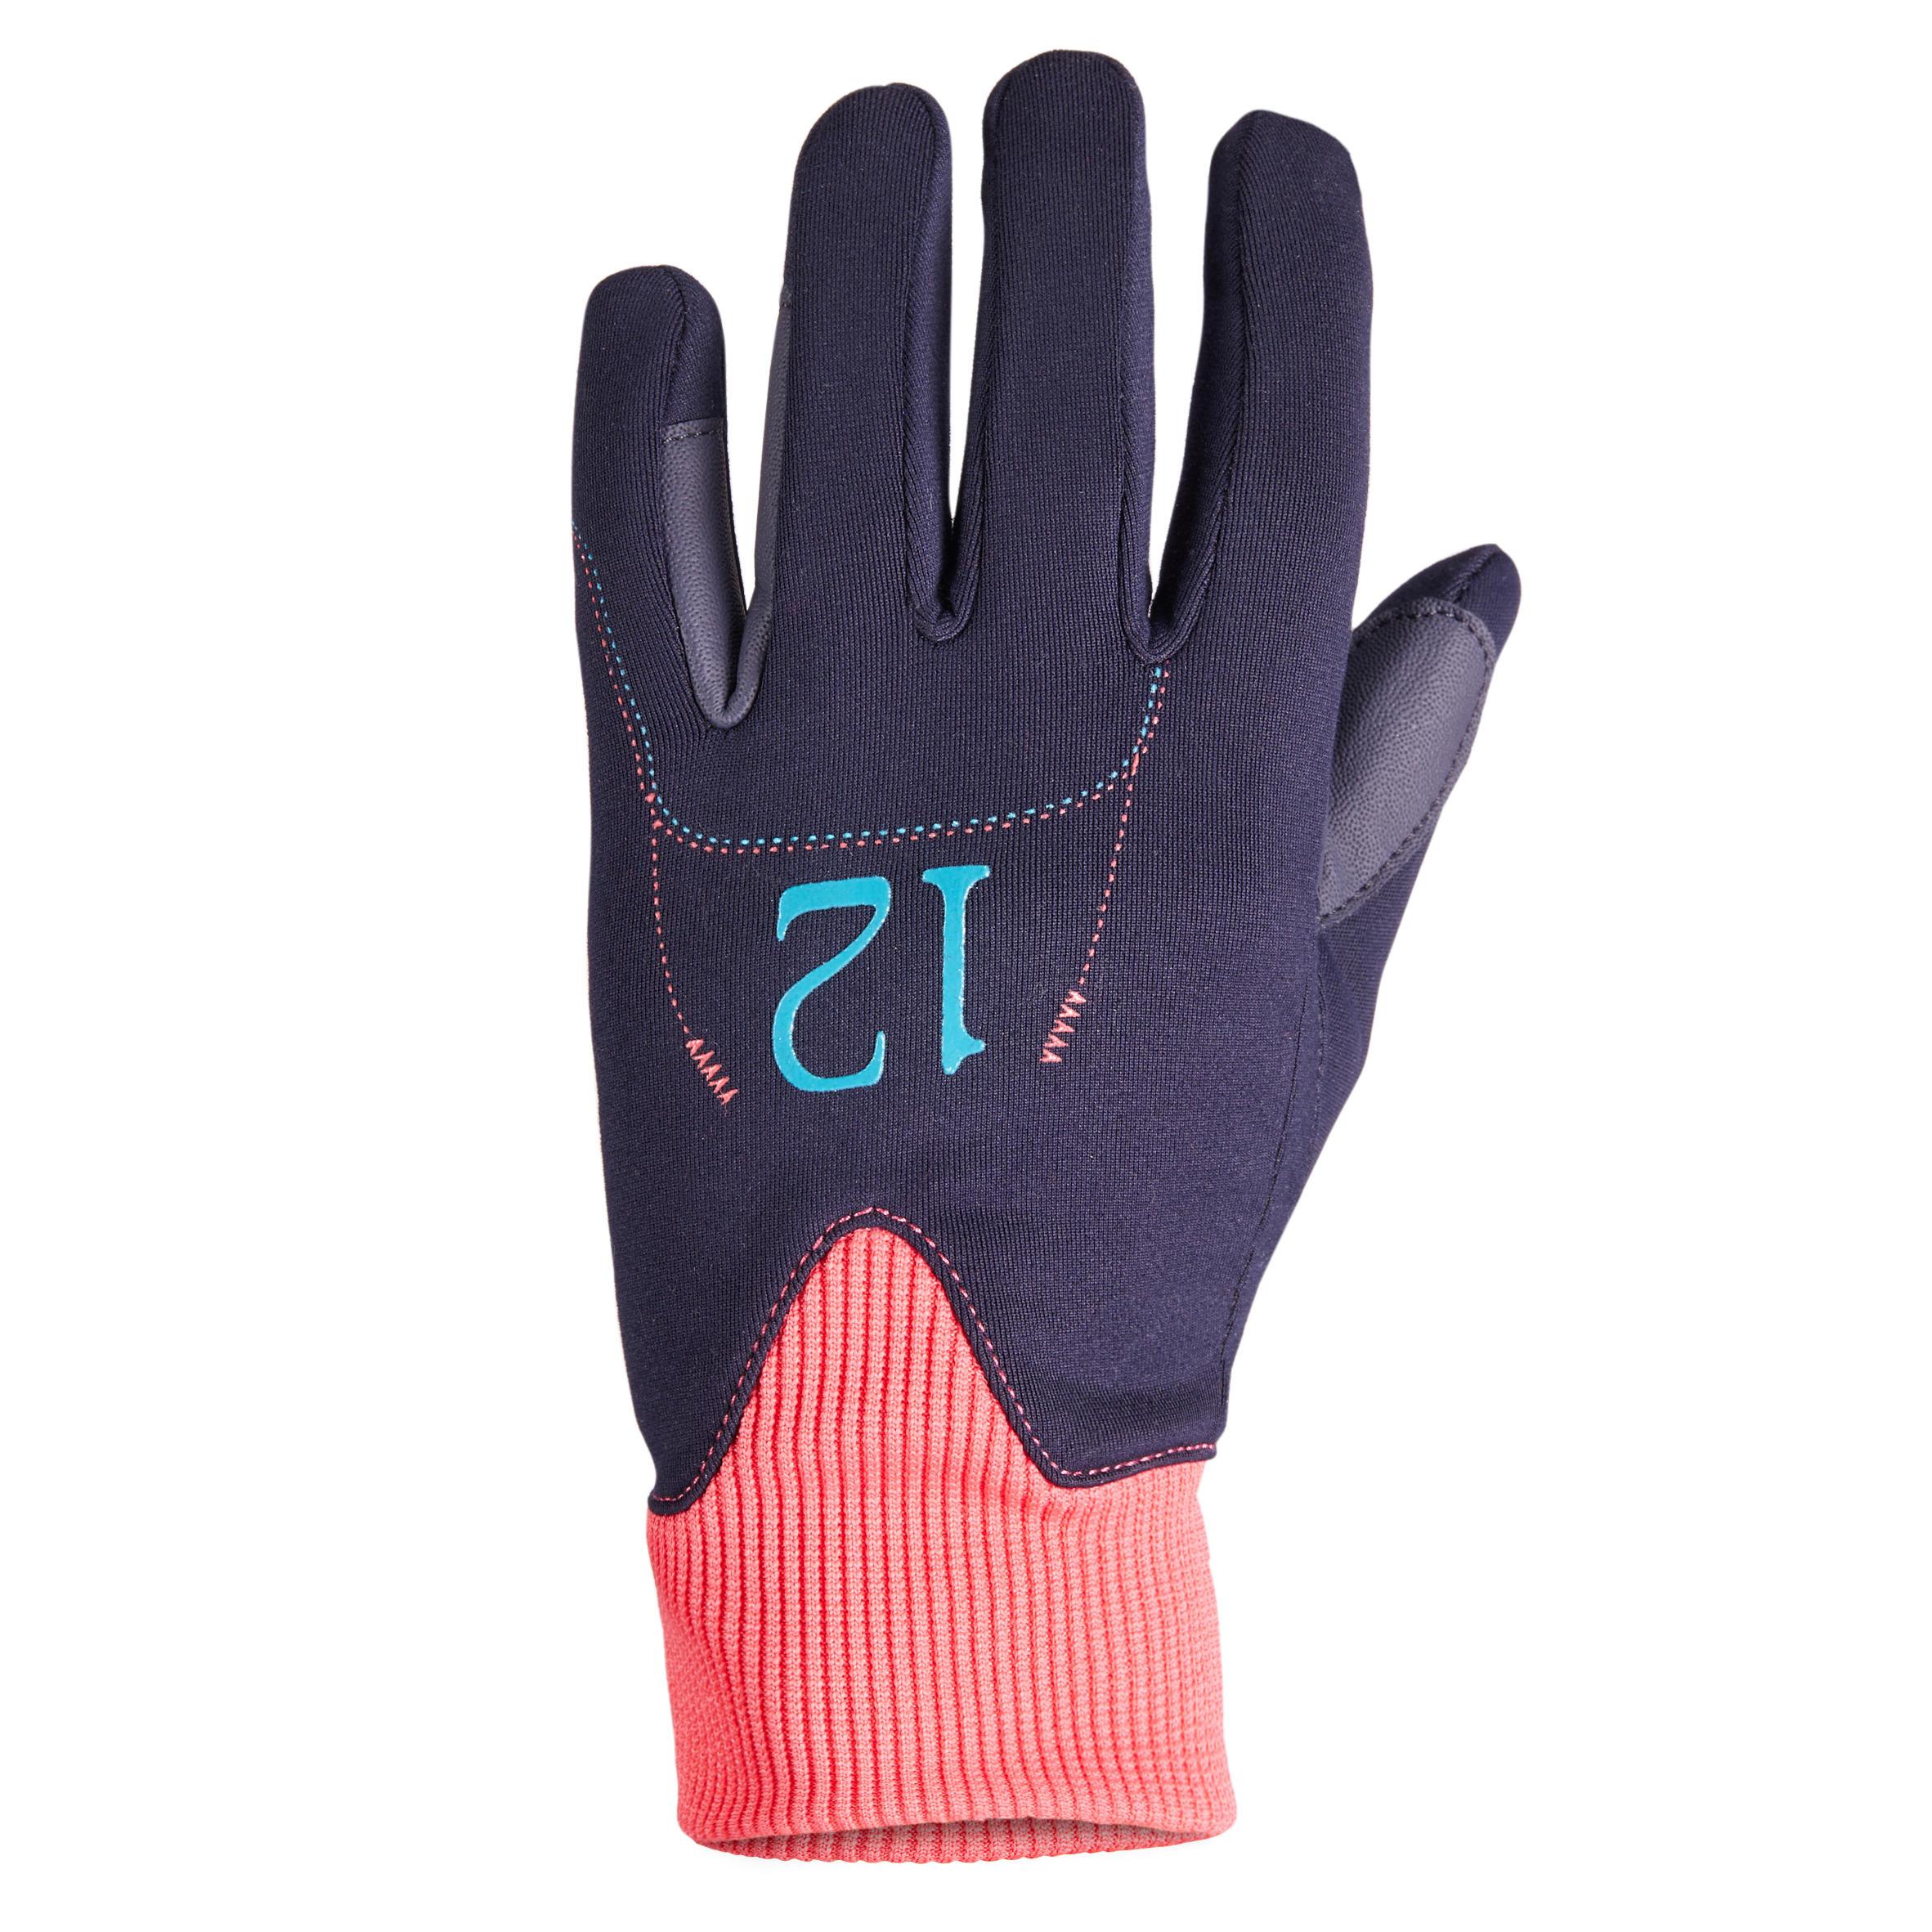 Easywear Children's Warm Horseback Riding Gloves - Navy Blue / Pink